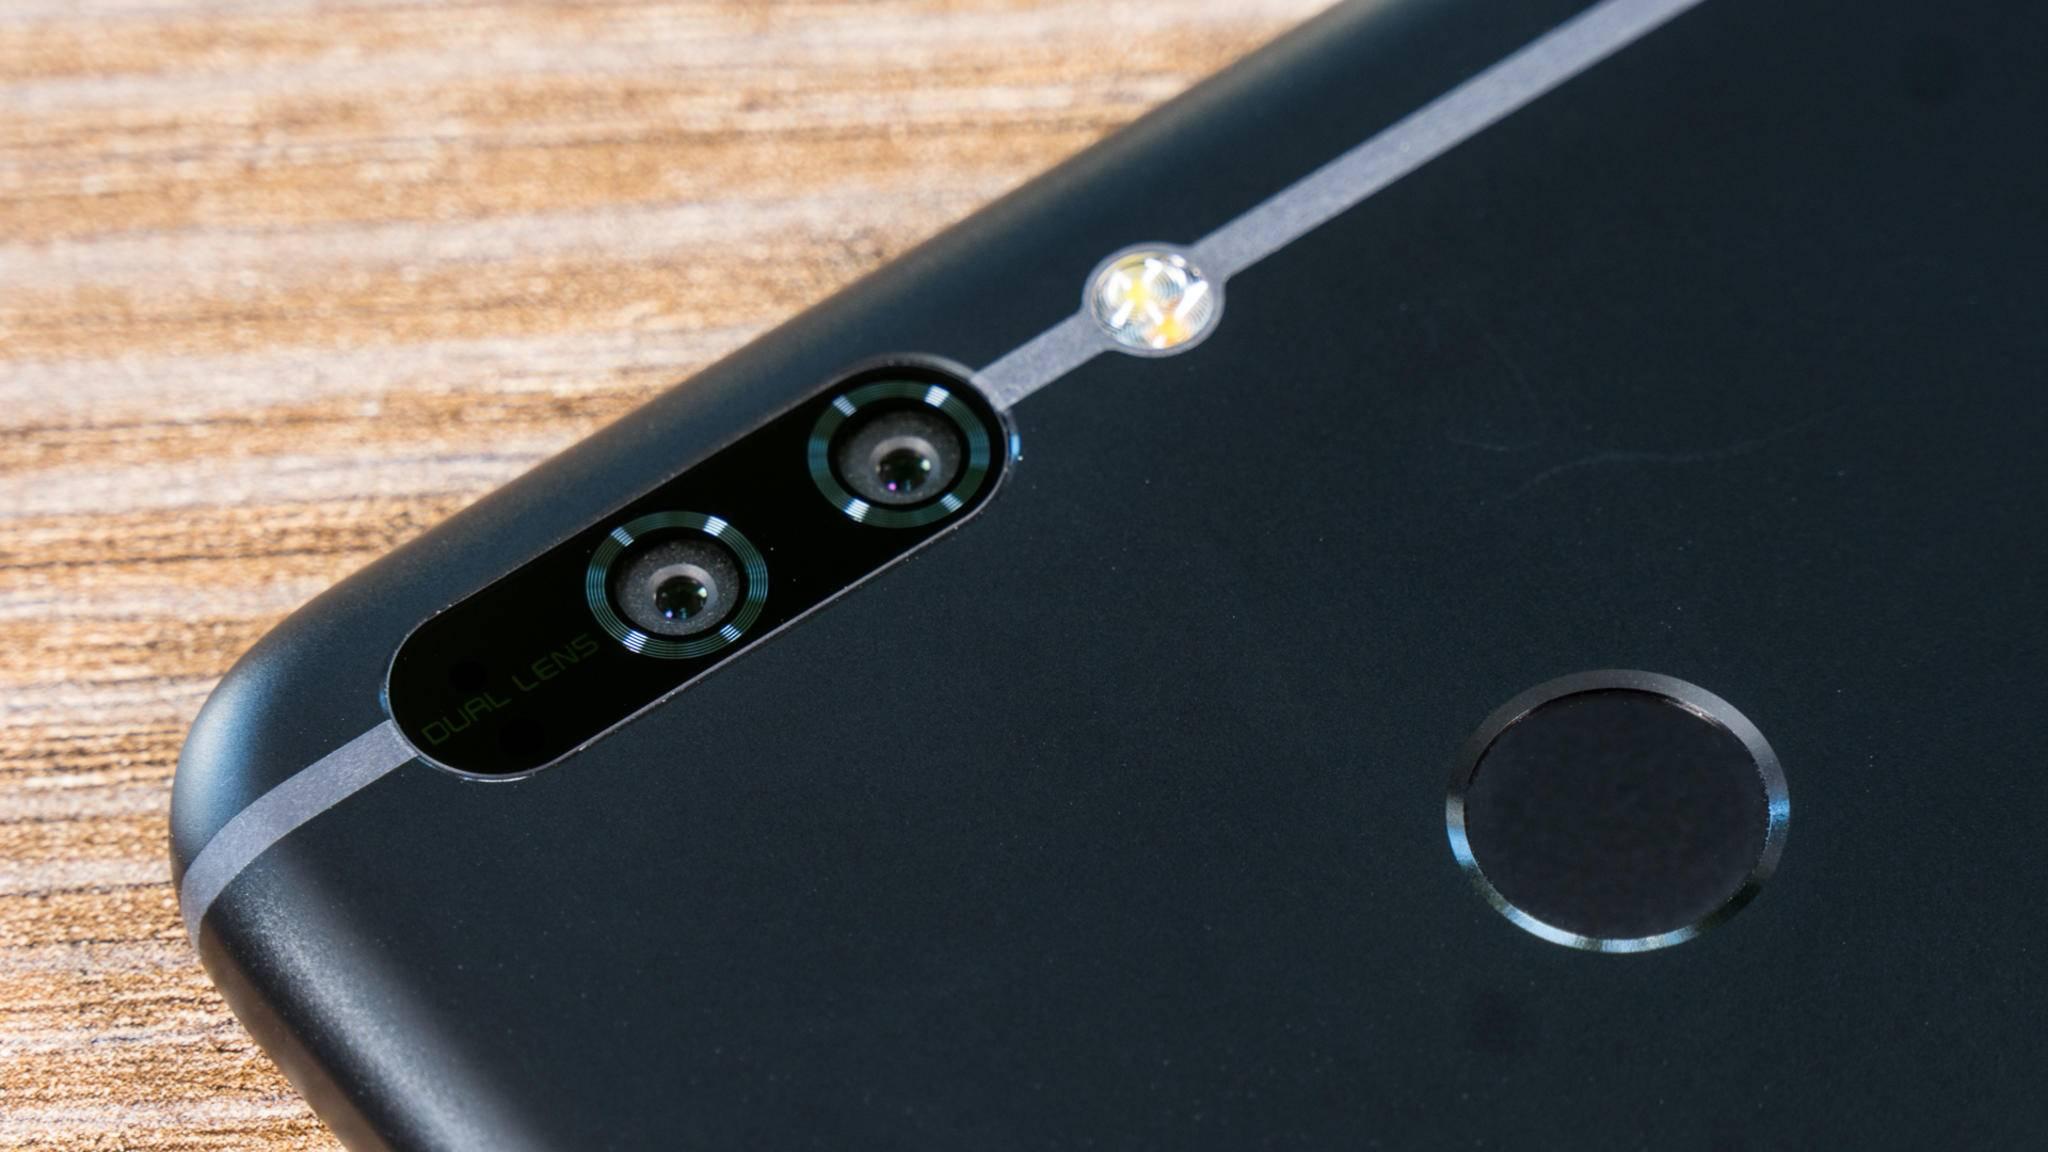 Das Honor 8 Pro tritt mit seiner Dual-Kamera gegen das Huawei Mate 9 an.